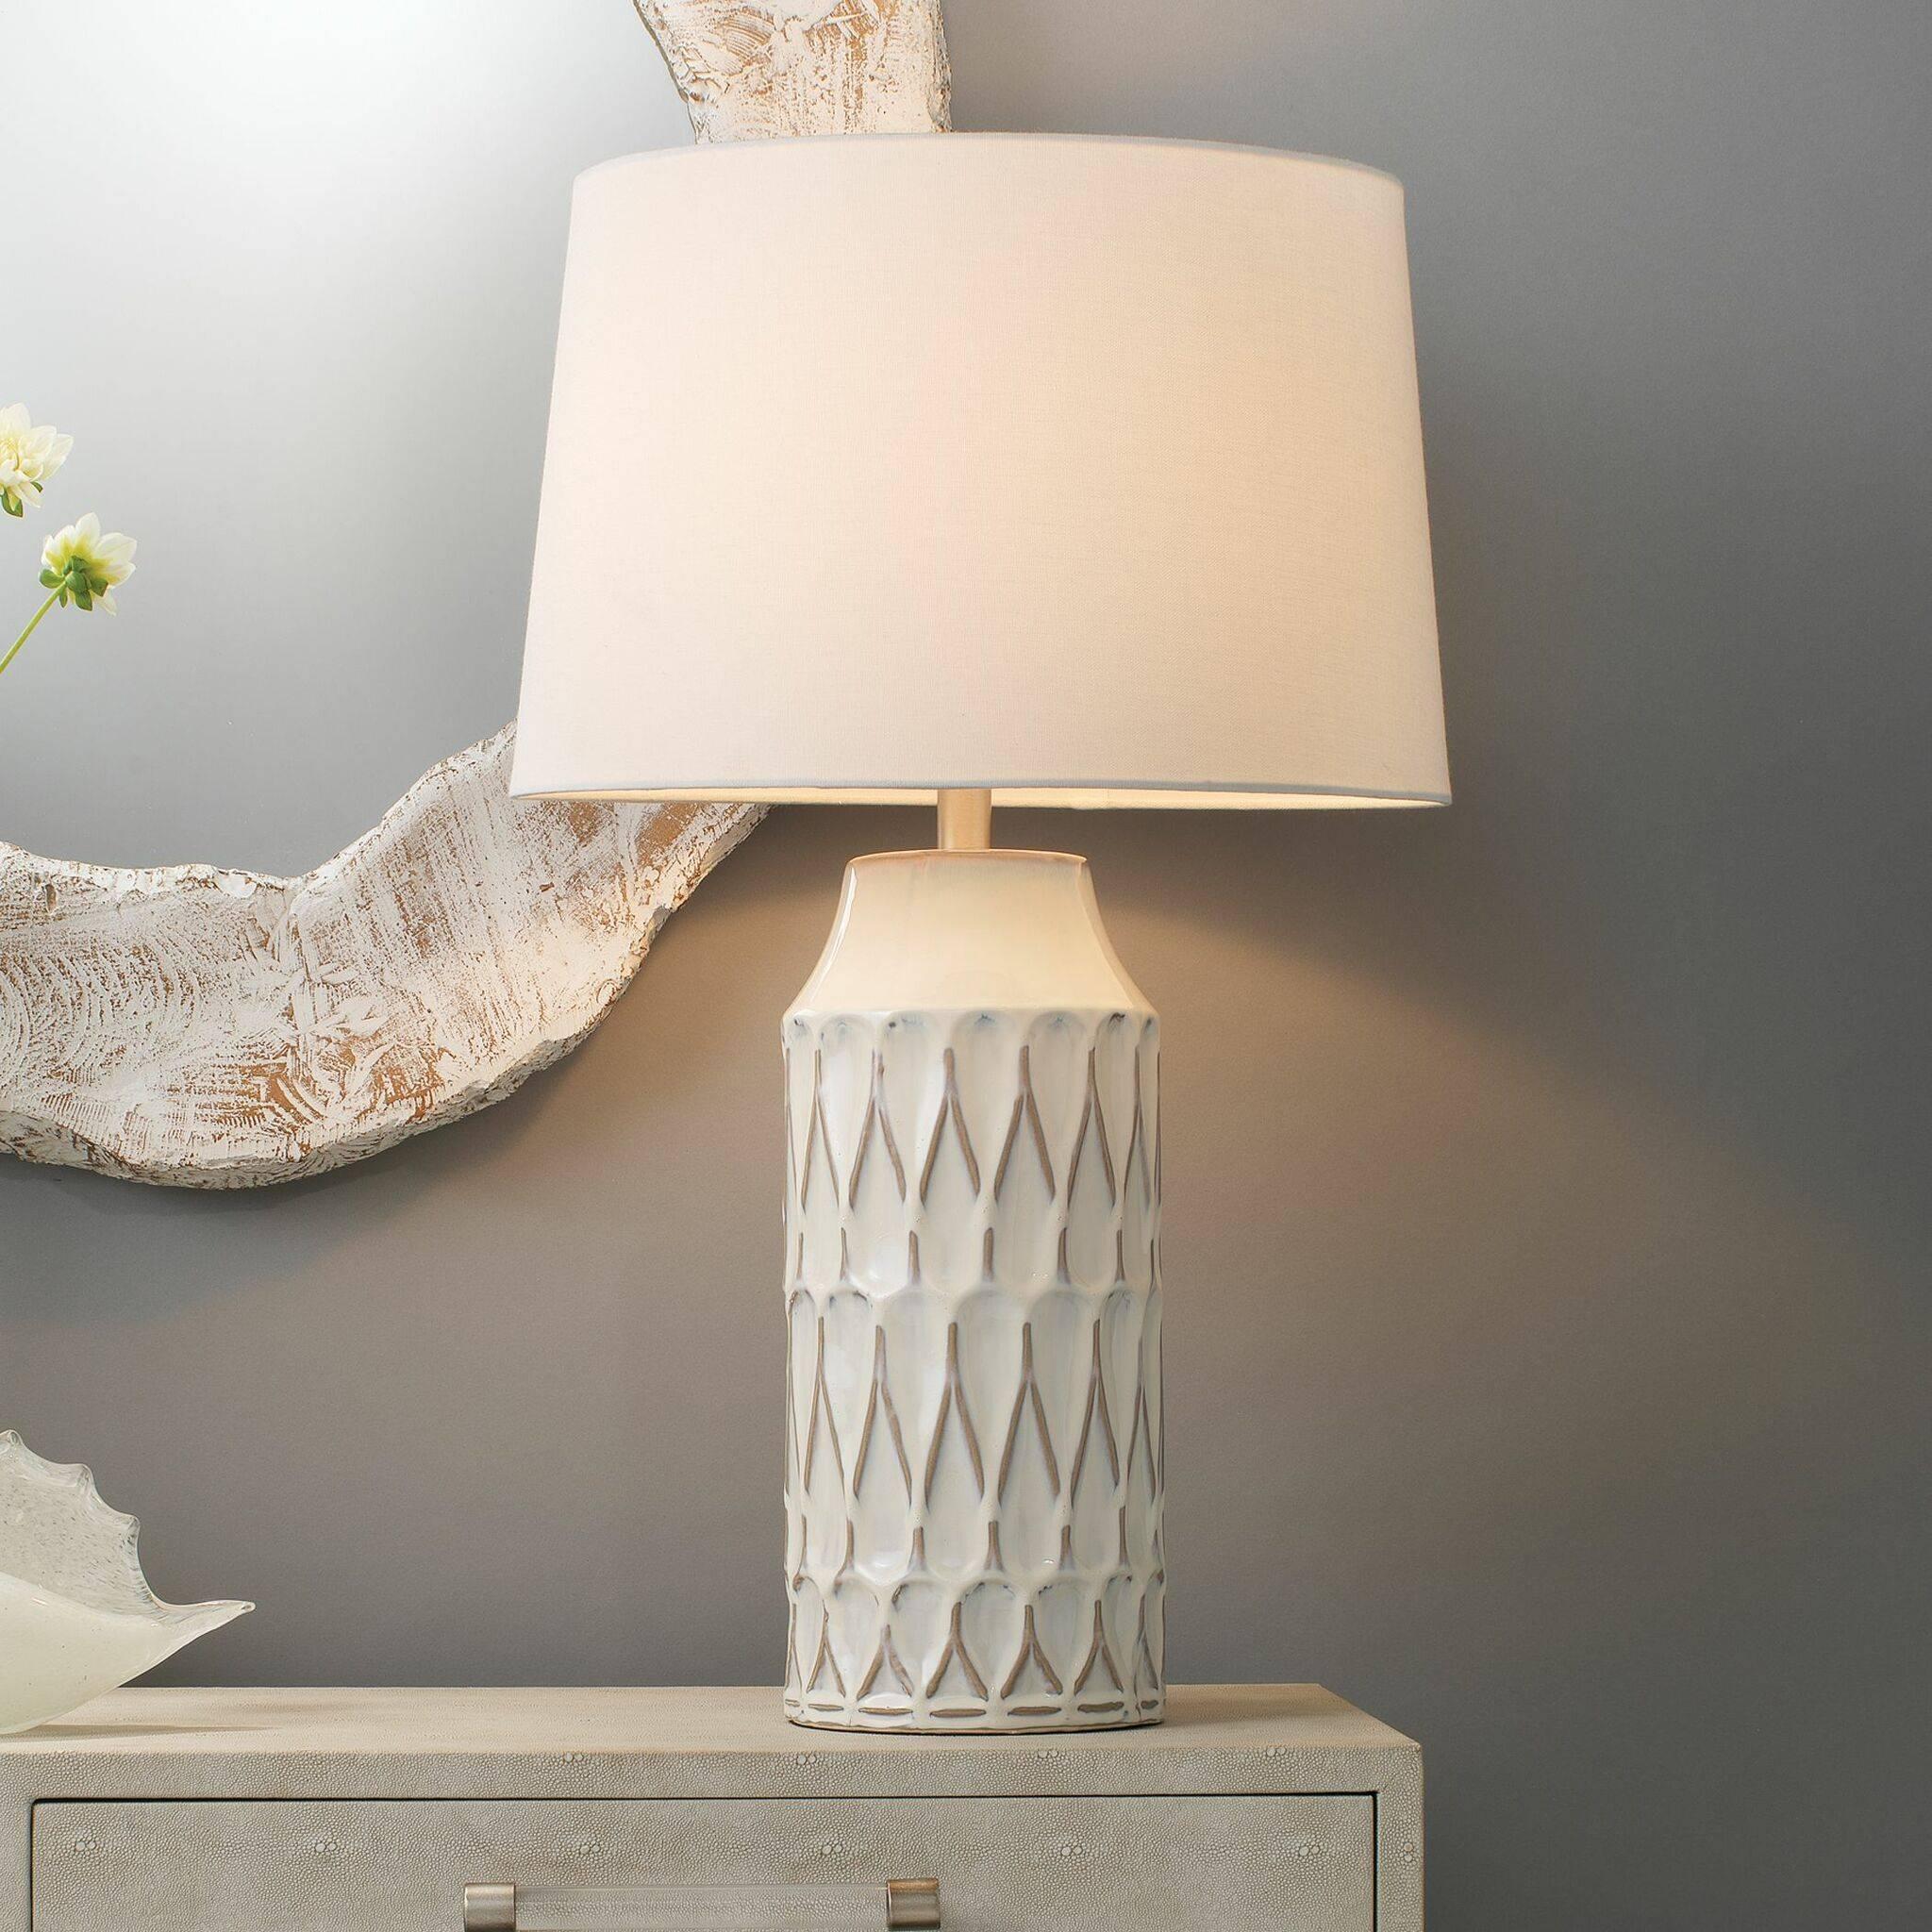 Fall Designer Lighting on Sale NOW - Save 10-20%